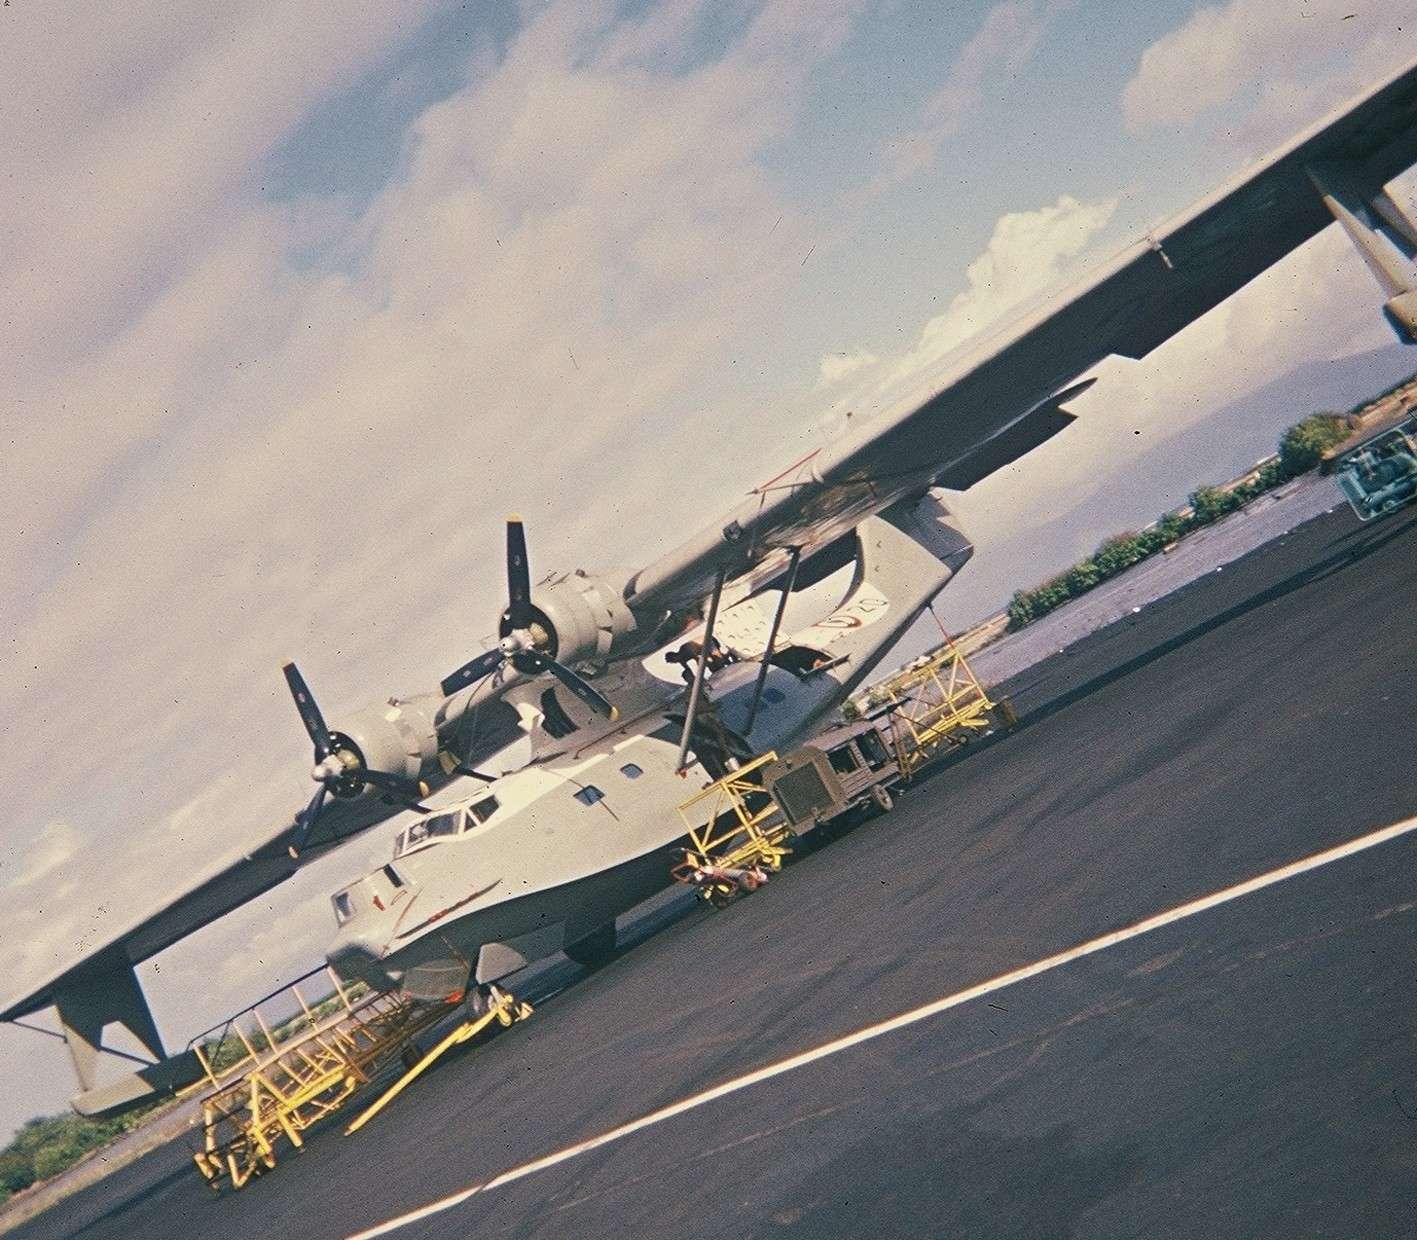 Tahiti] Aéroport Faa'a  durant les campagnes. Cd2_pa24